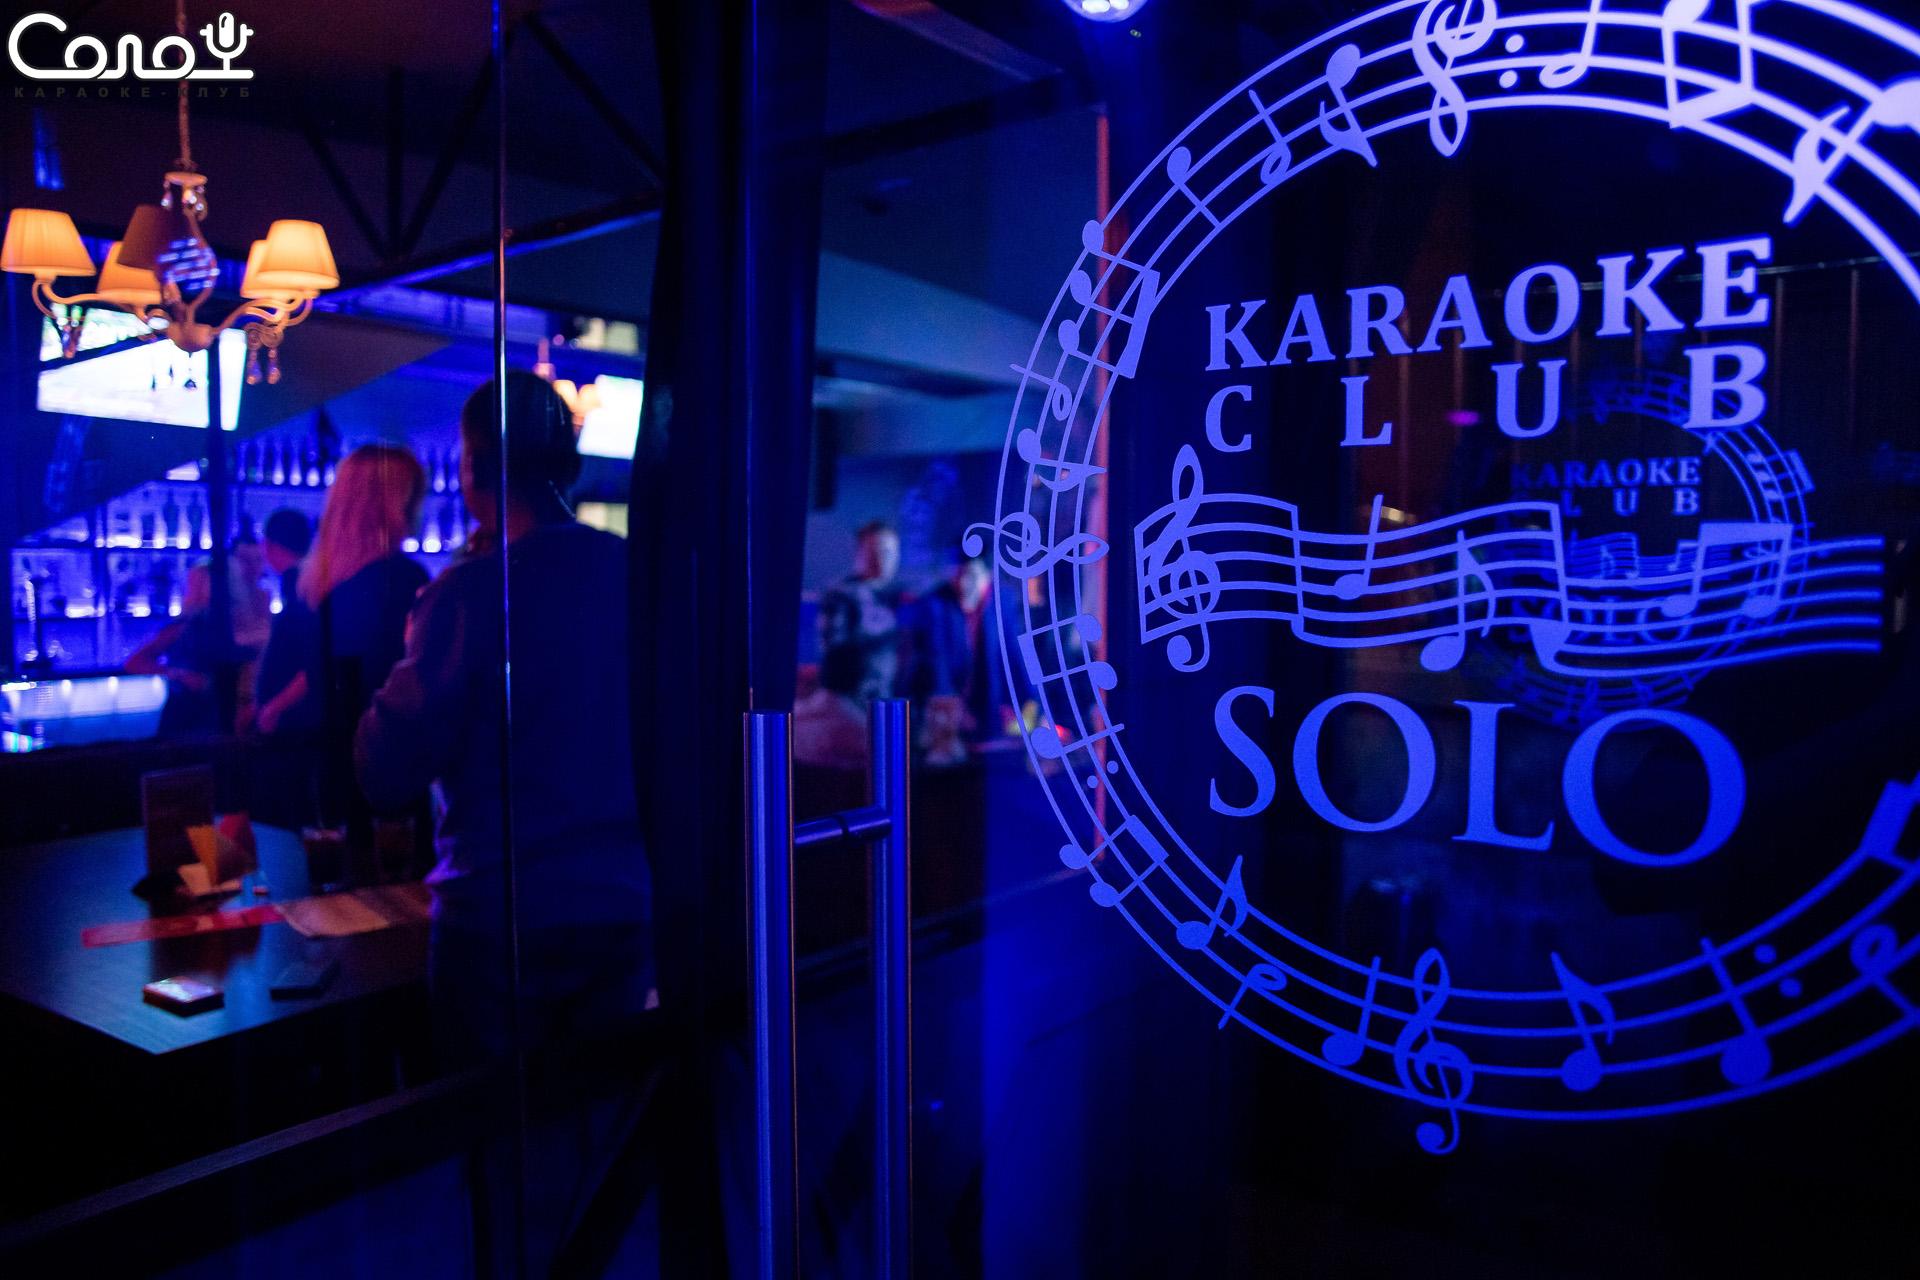 Работа в караоке клубе москва вакансии администратор в ночном клубе москва